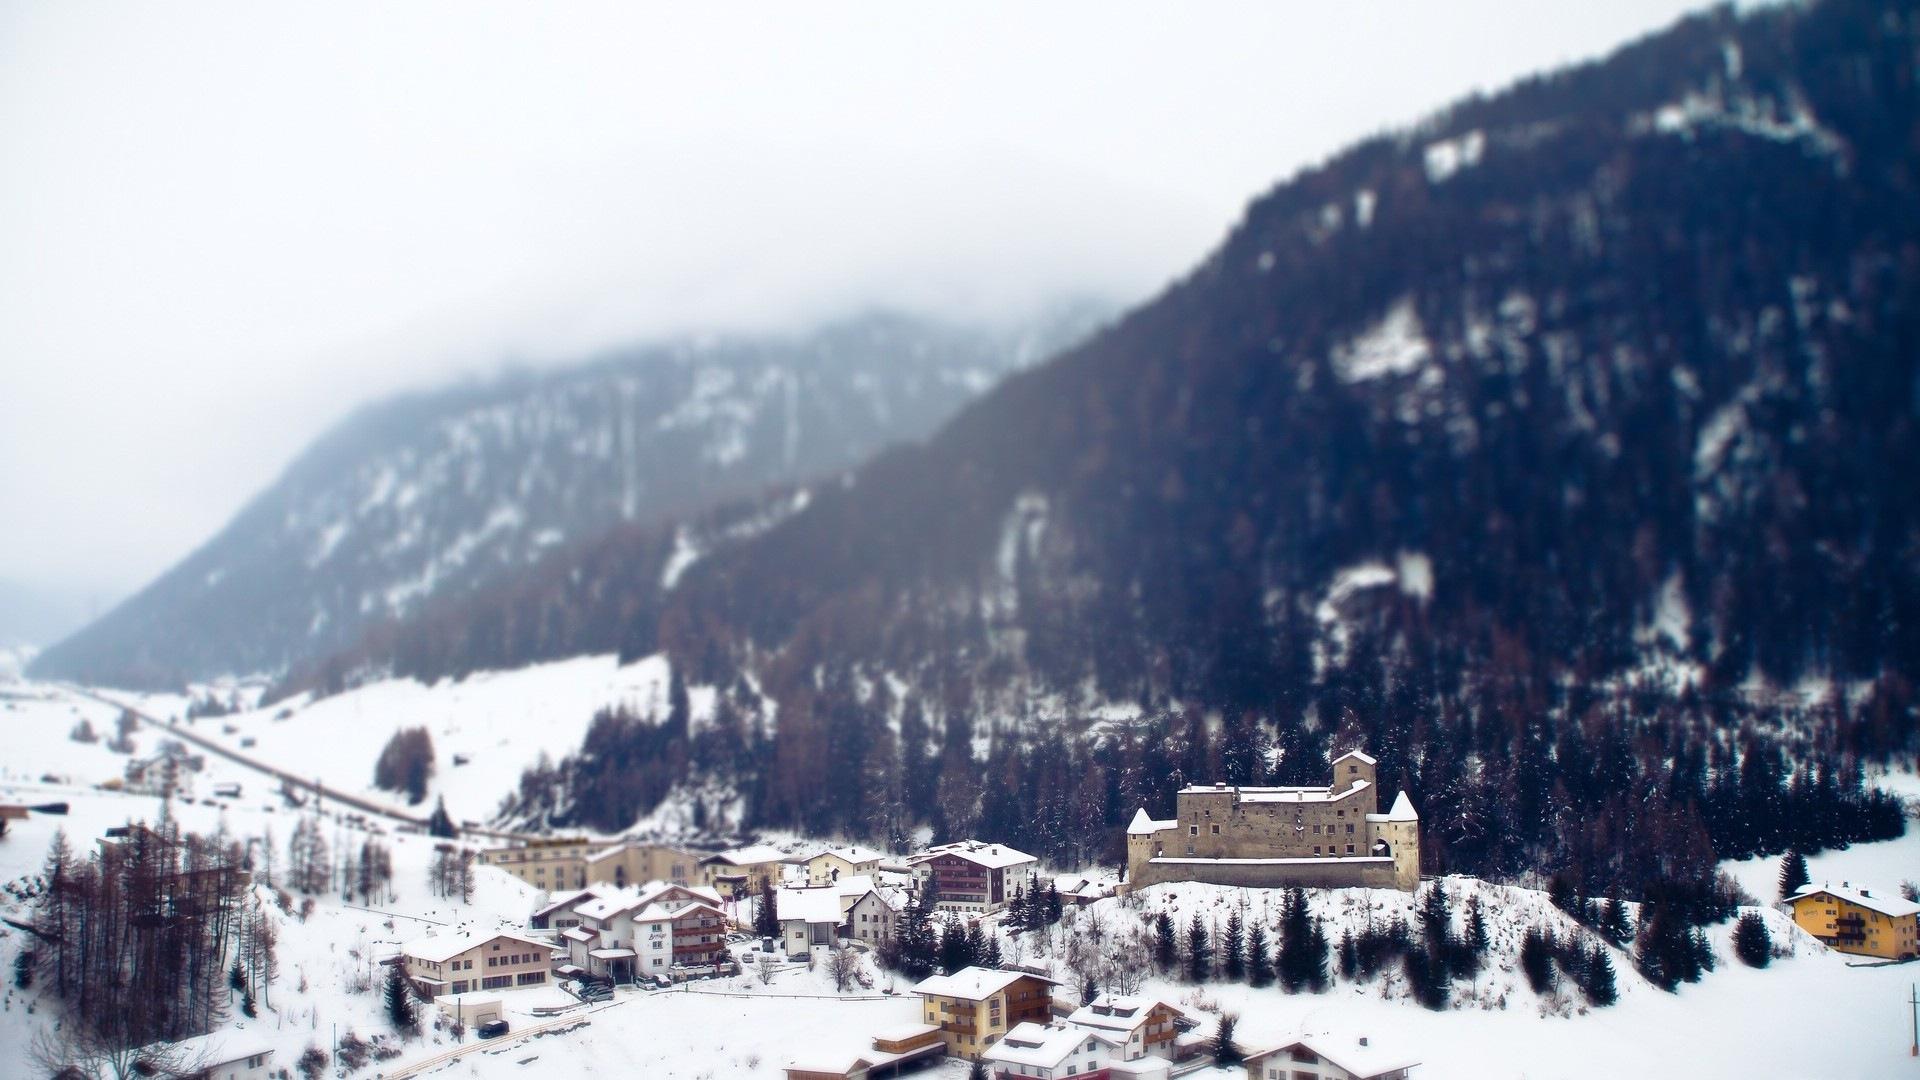 Winter Schnee Berge Seen Baume Strassen Hd Wallpaper 16